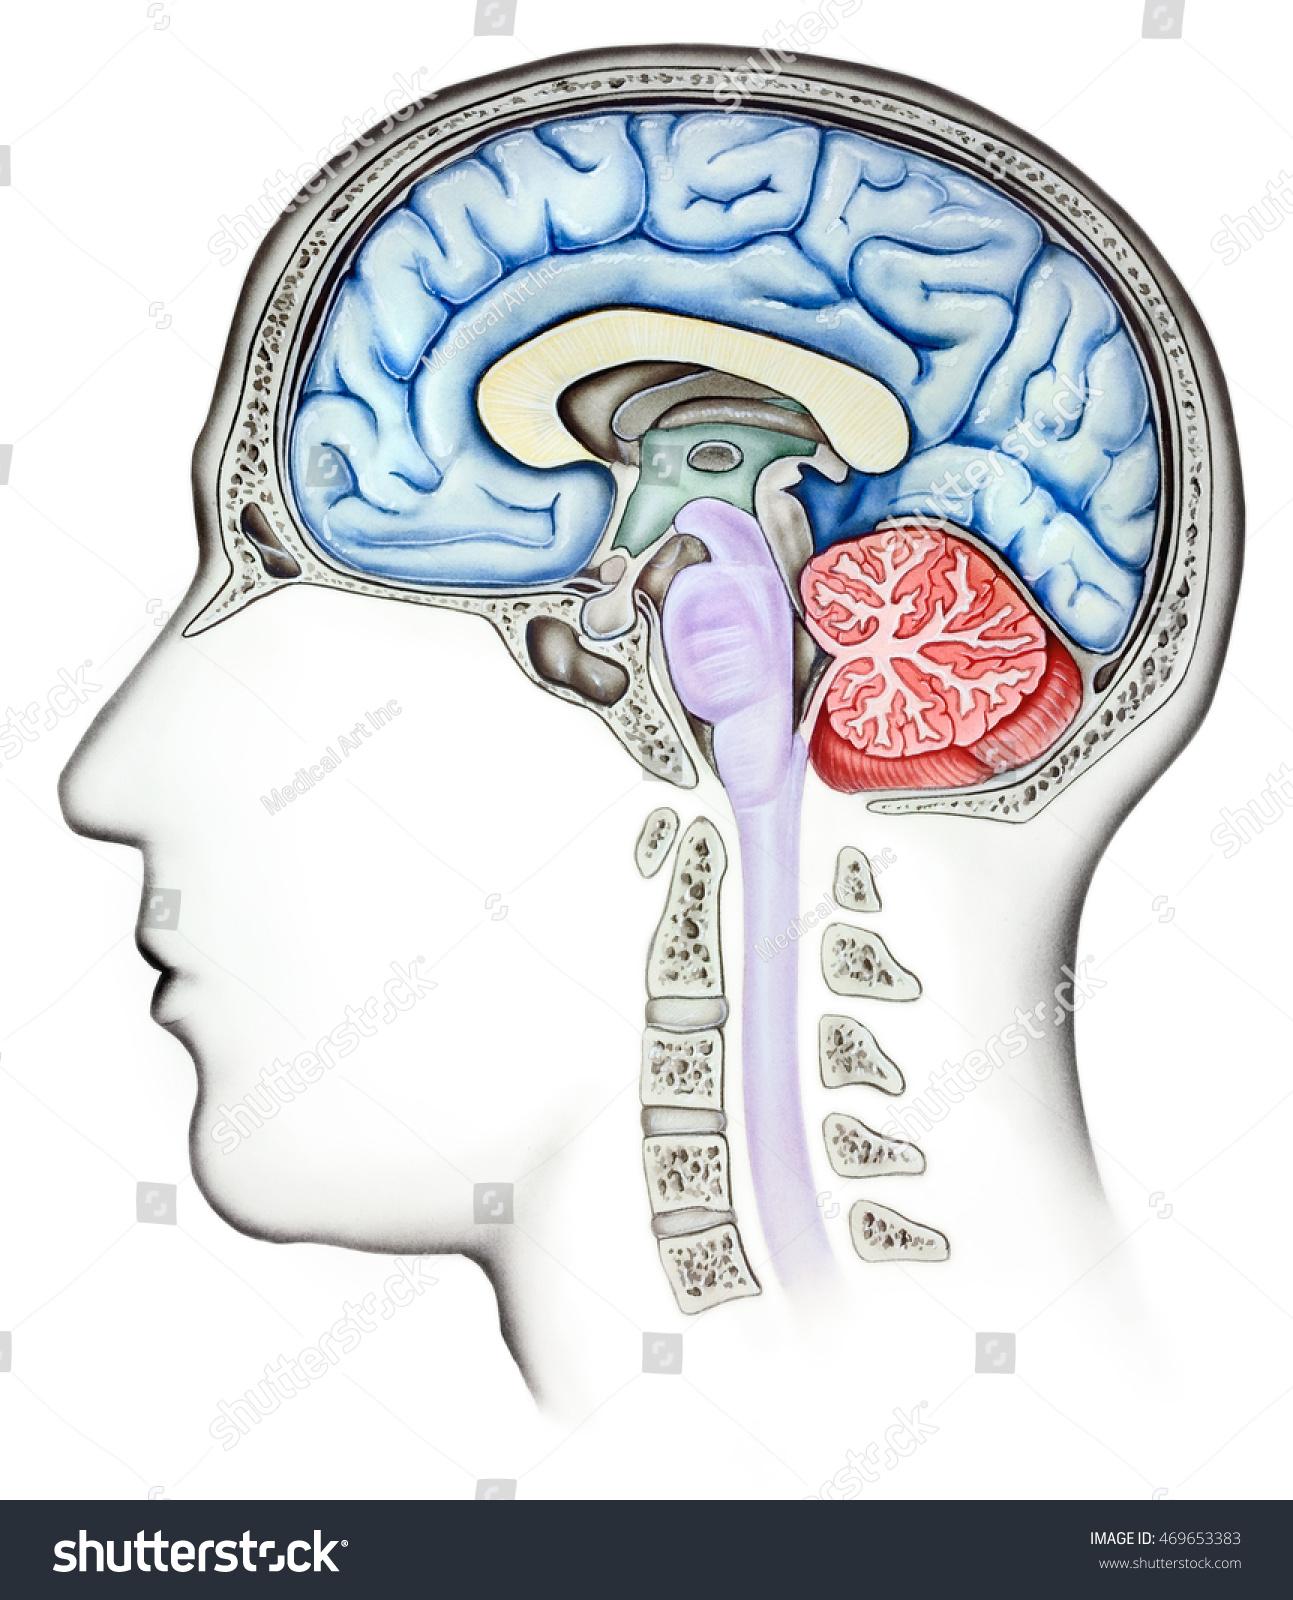 Royalty Free Stock Illustration of Anatomy Human Brain Cutaway Side ...